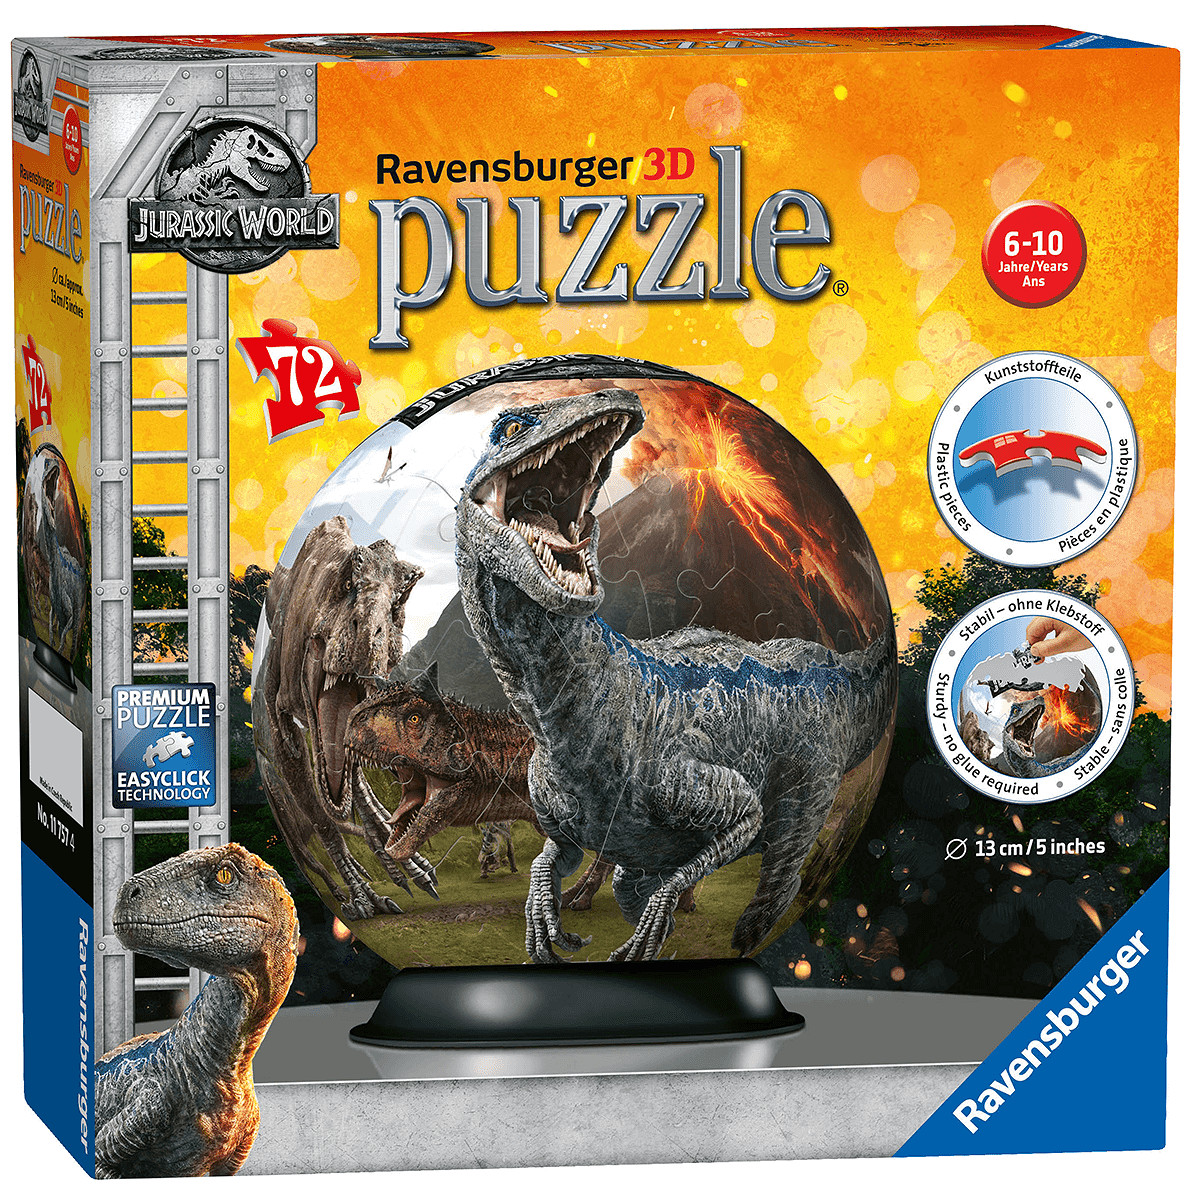 Fallen Kingdom XXL 100 Piece Jigsaw Puzzle Ravensburger Jurassic World